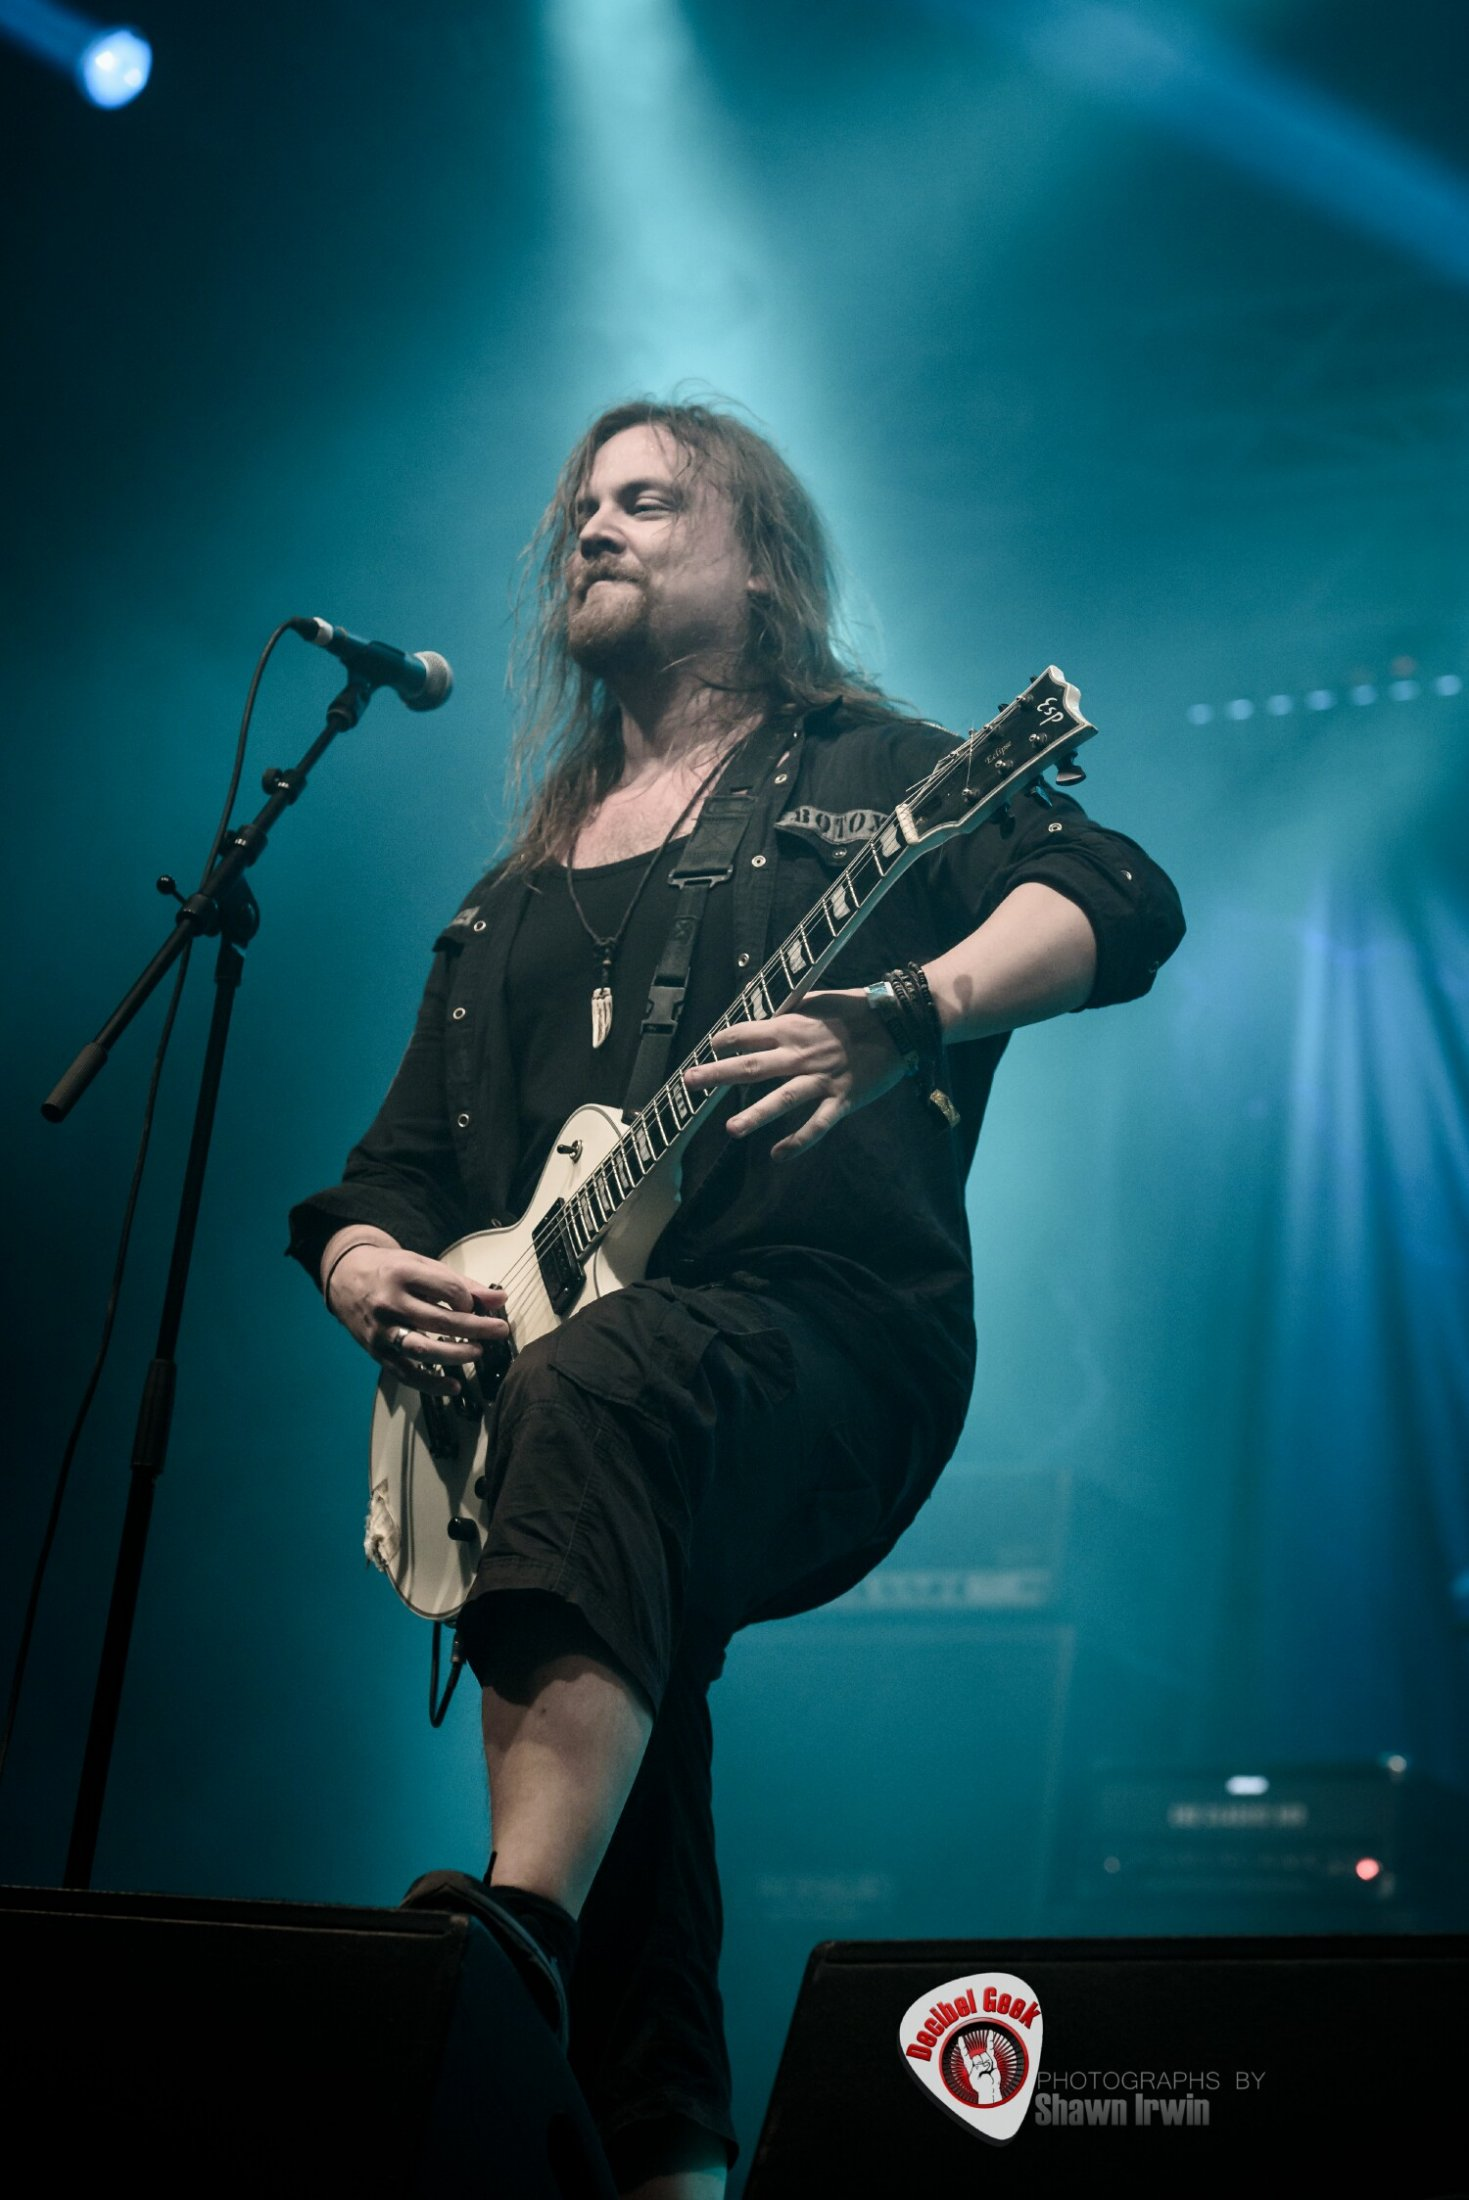 Dynasty #5-Sweden Rock 2019-Shawn Irwin